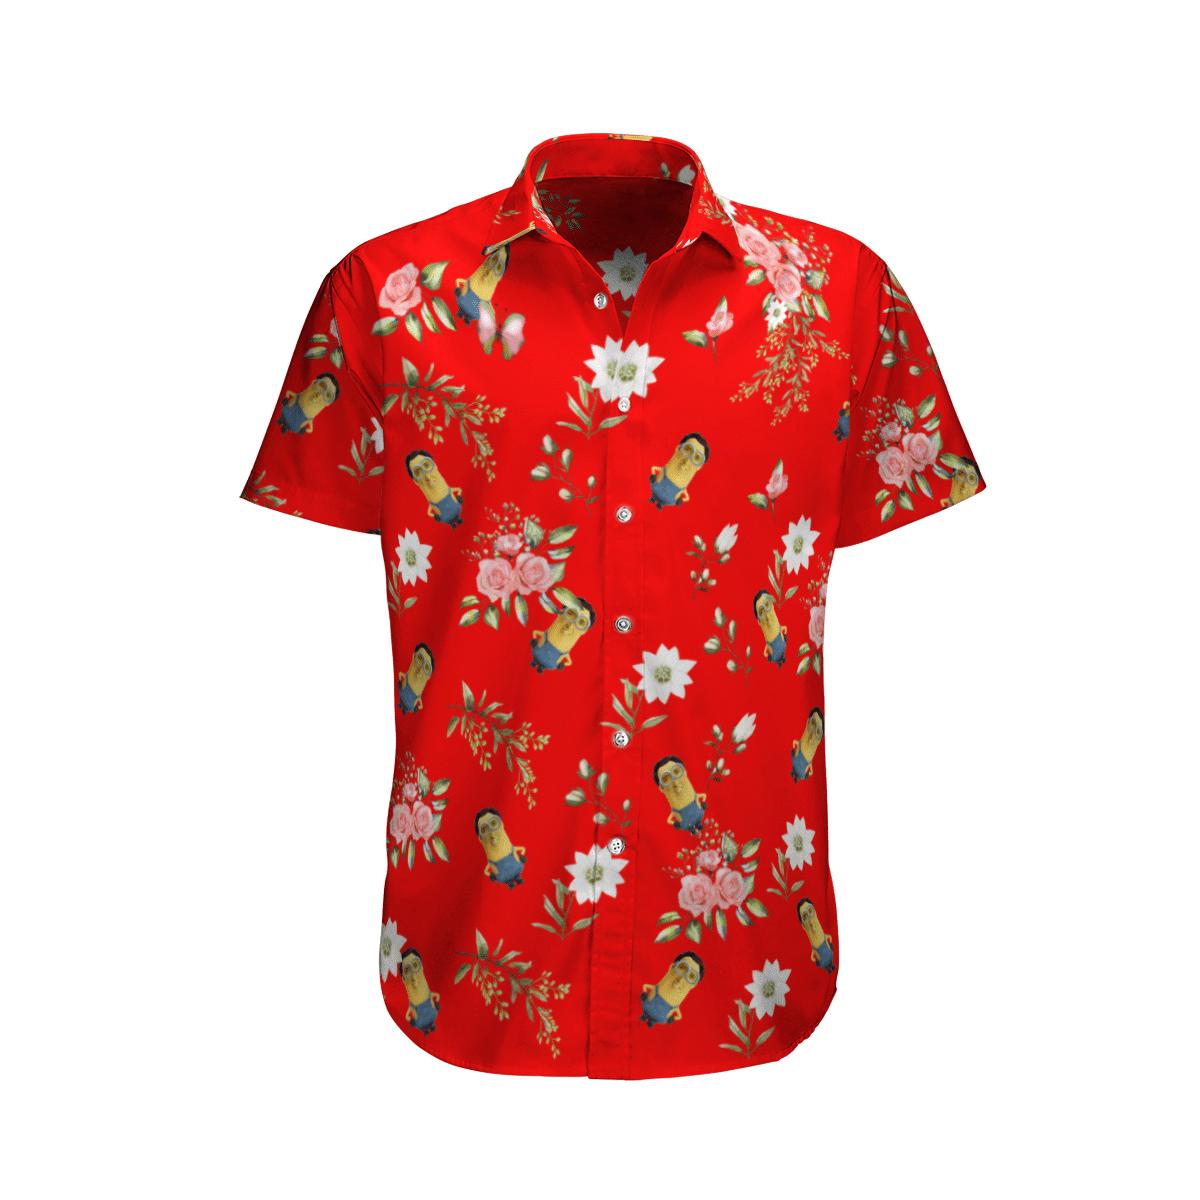 Minions cage Hawaiian shirt - LIMITED EDITION